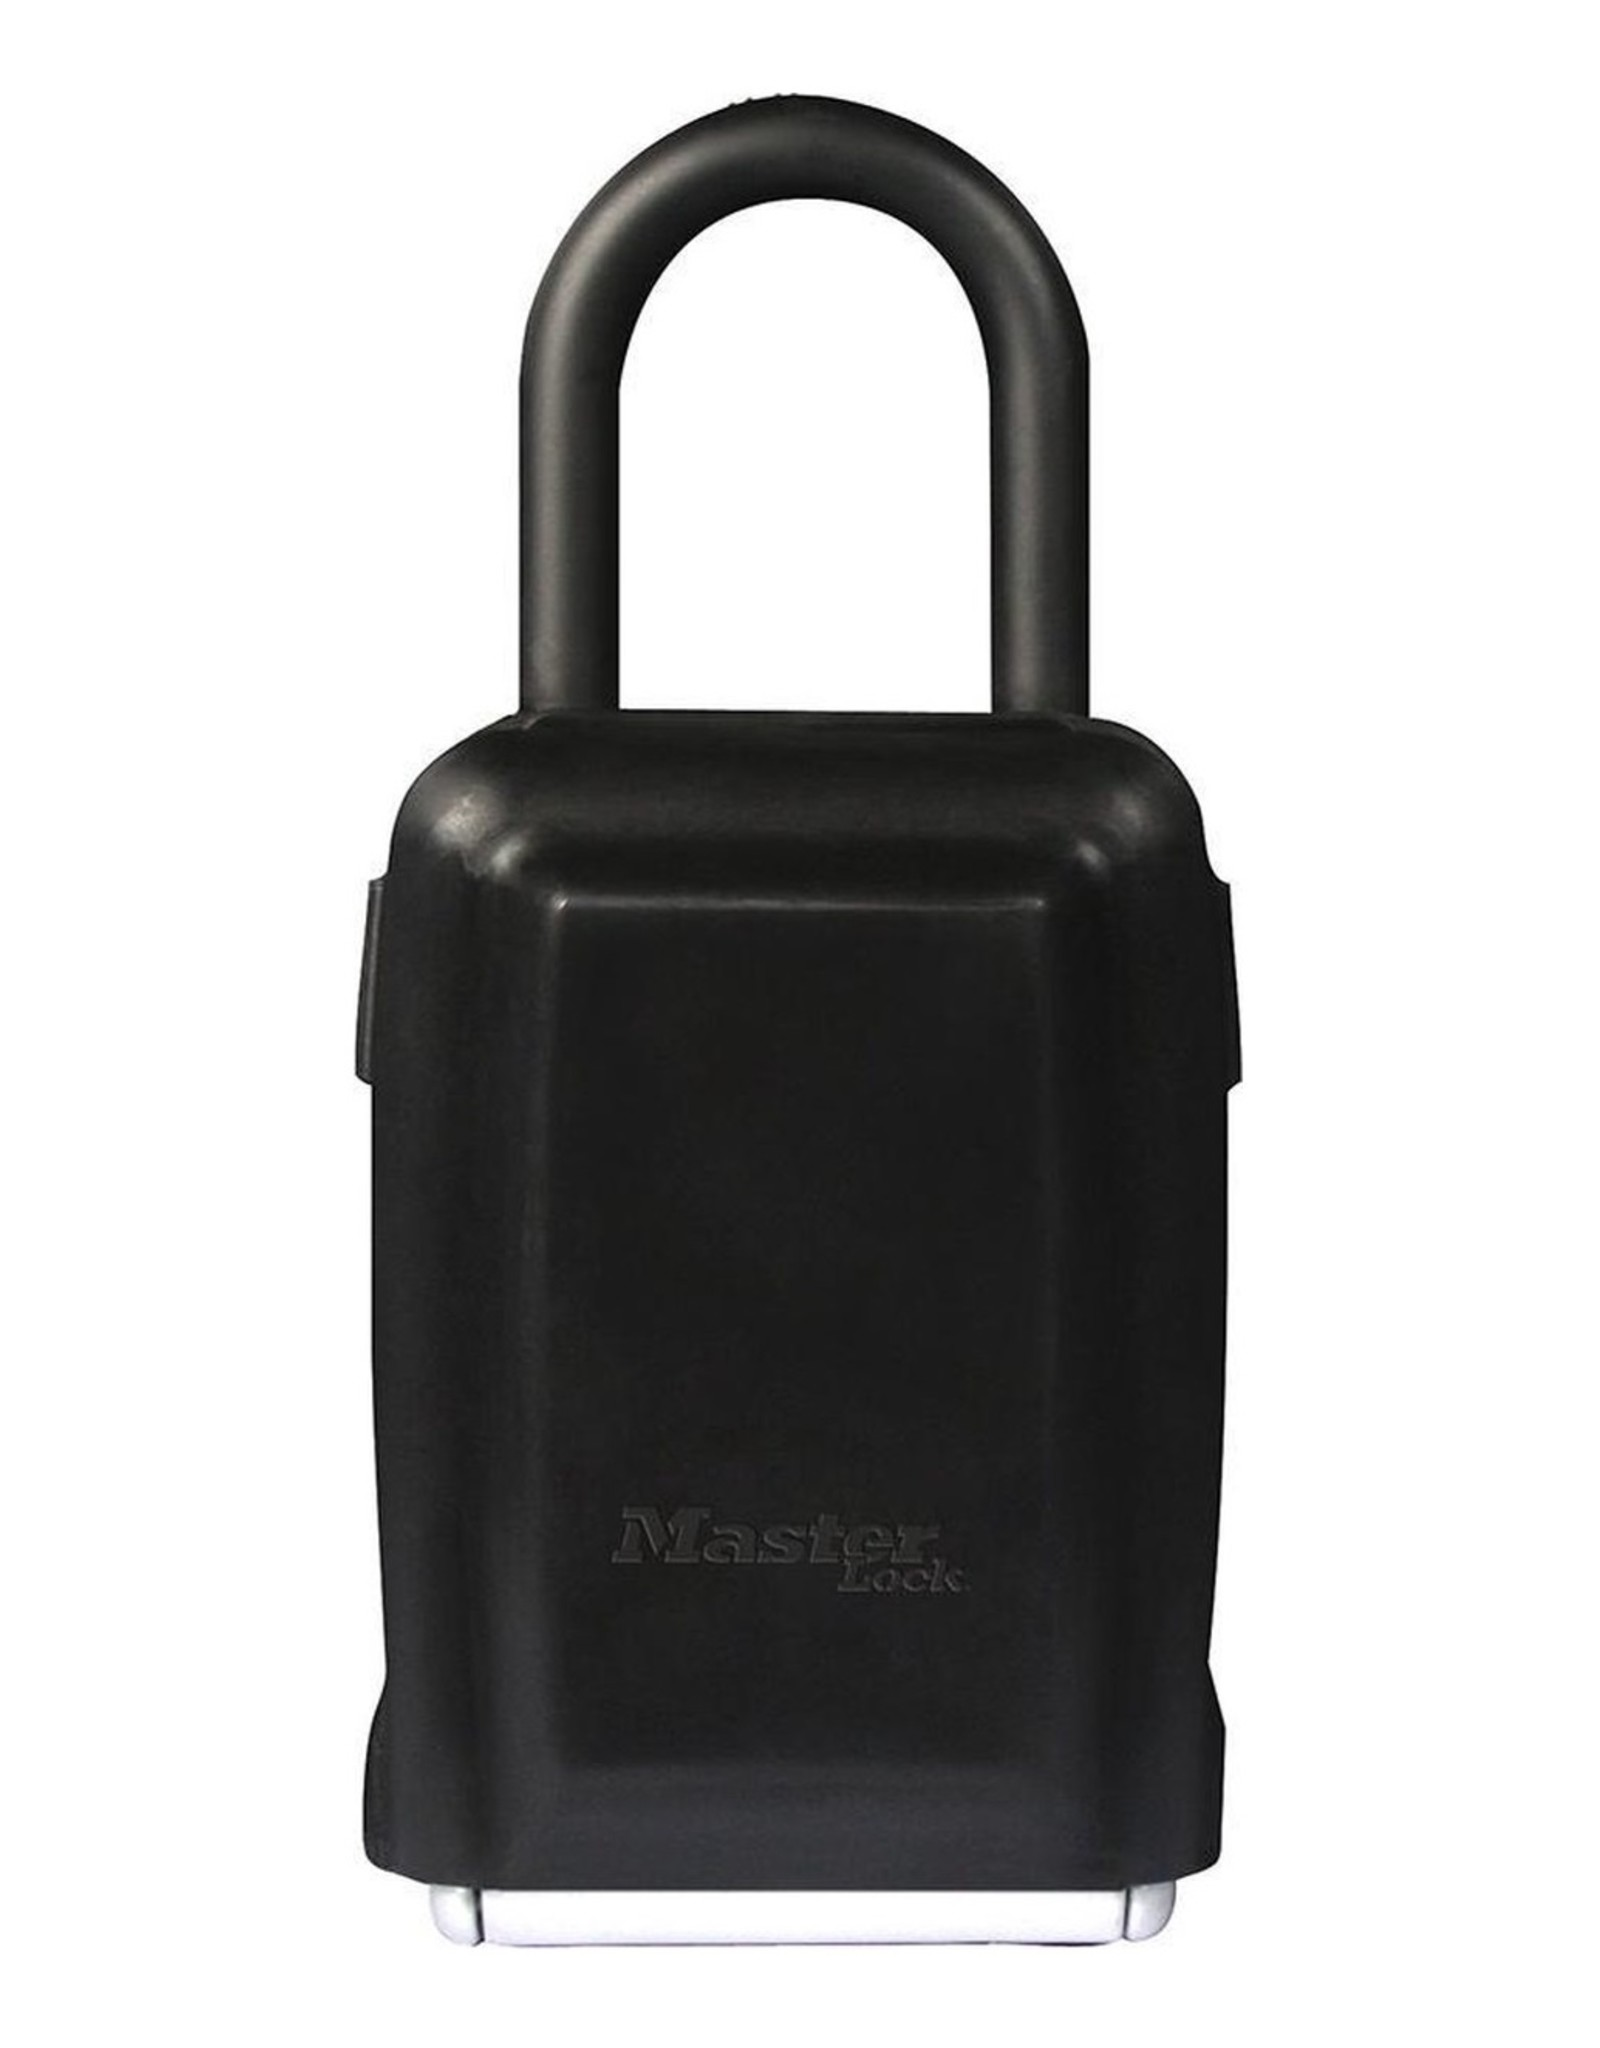 MasterLock MasterLock - Sleutelkast met drukknoppen - En beugel - 5422D